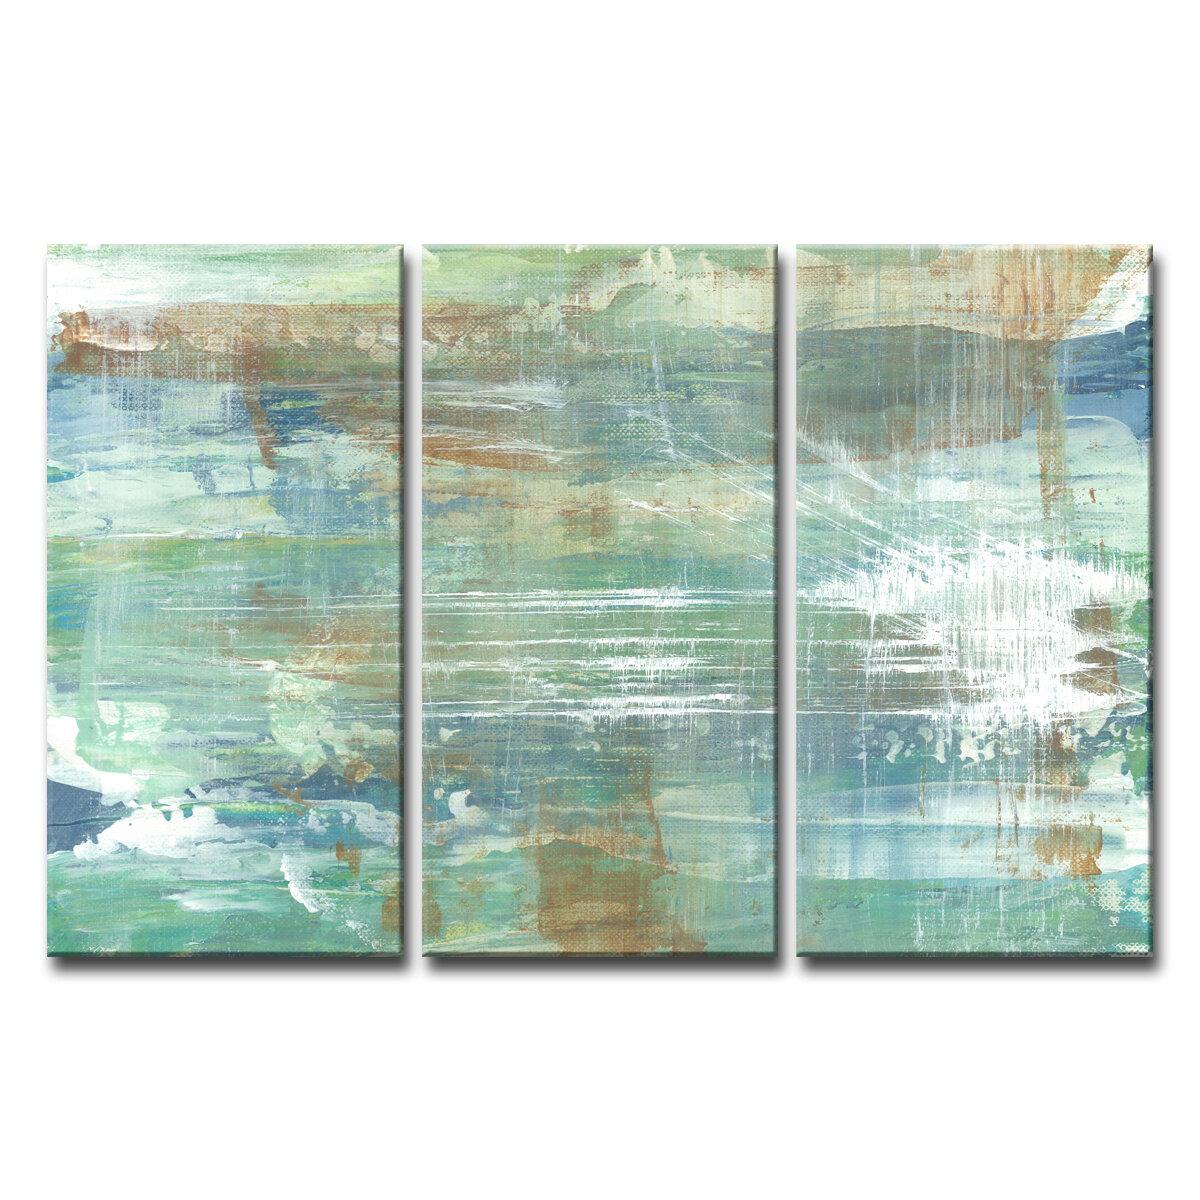 Copper and Blue 3 piece set